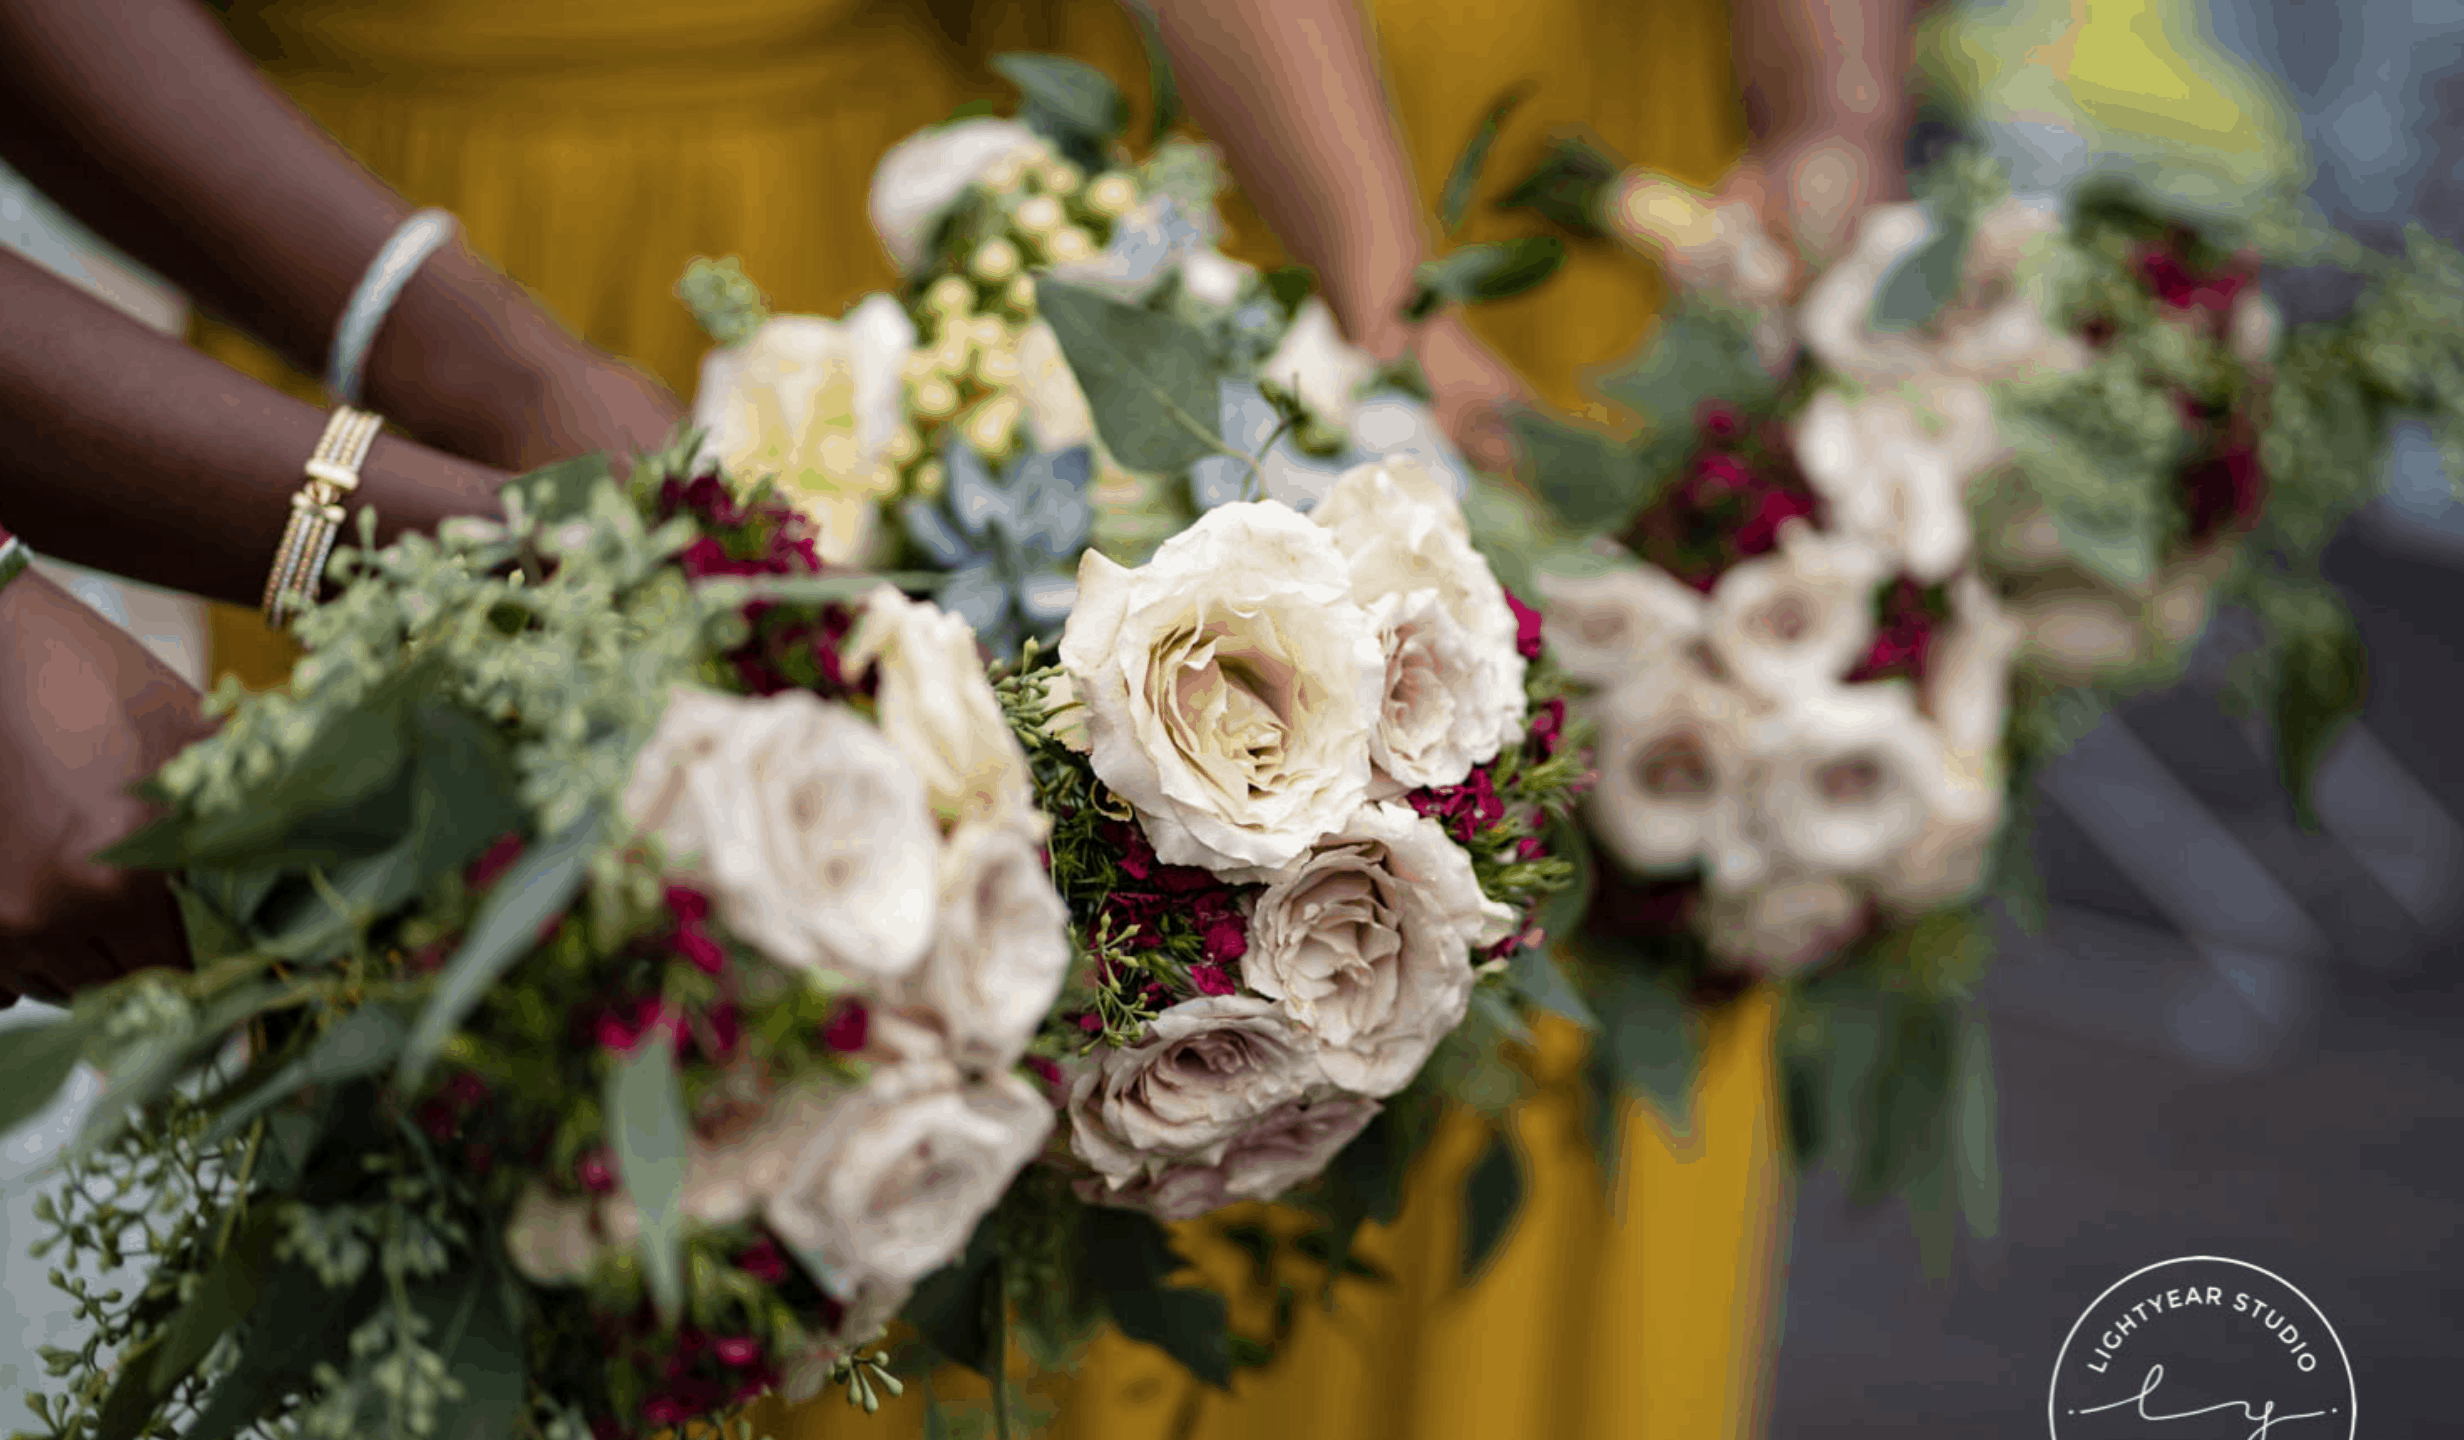 JG Domestic Cira Centre Wedding Elegant Events Planning and Design 15b